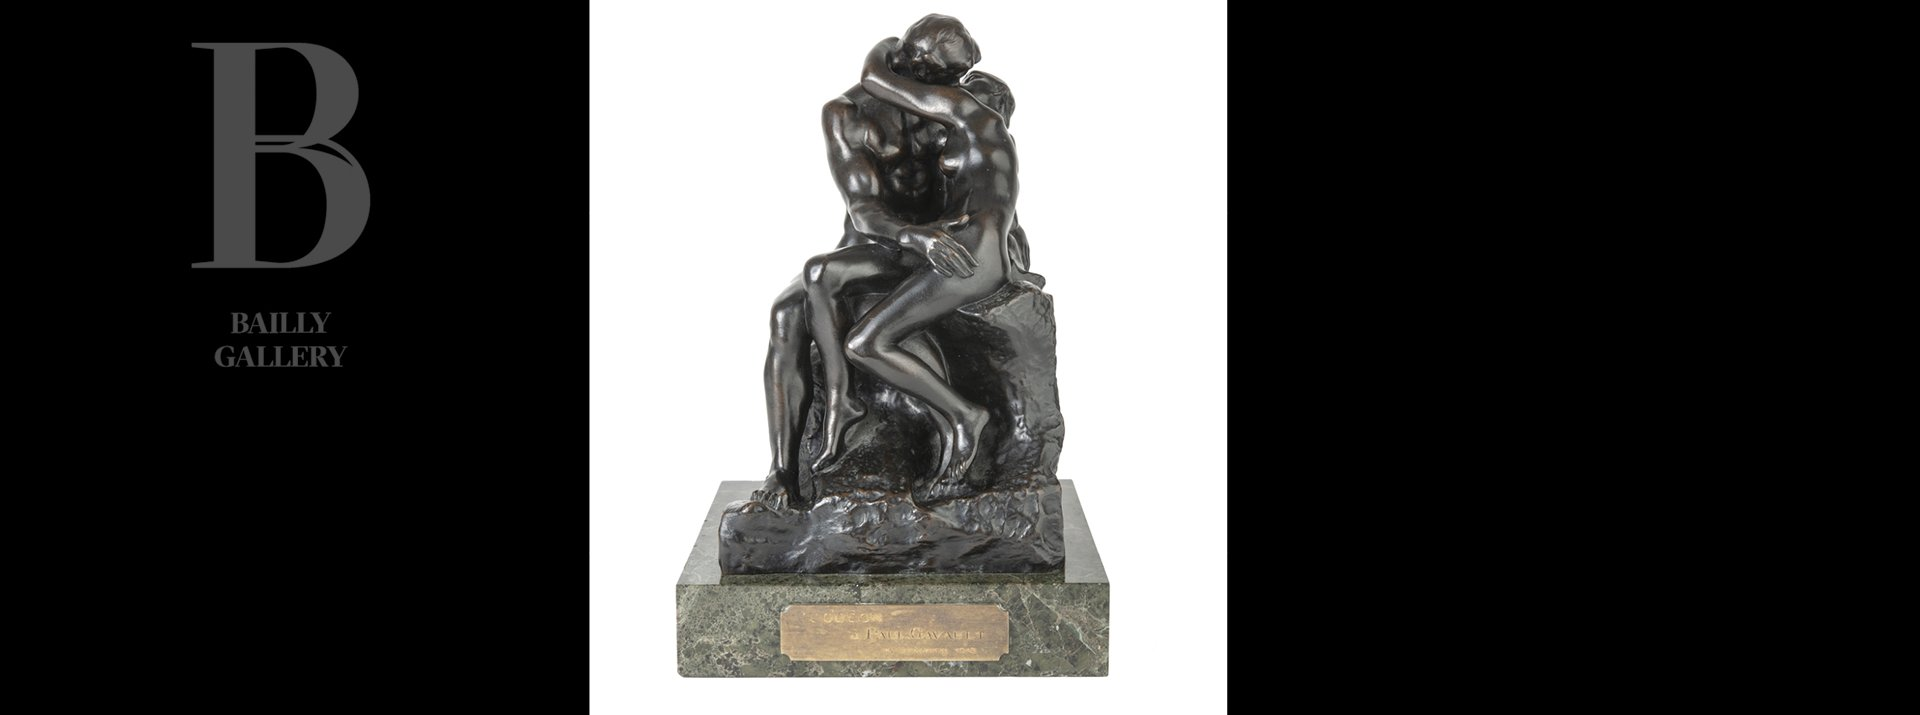 auguste-rodin-sculpture-bronze.jpg